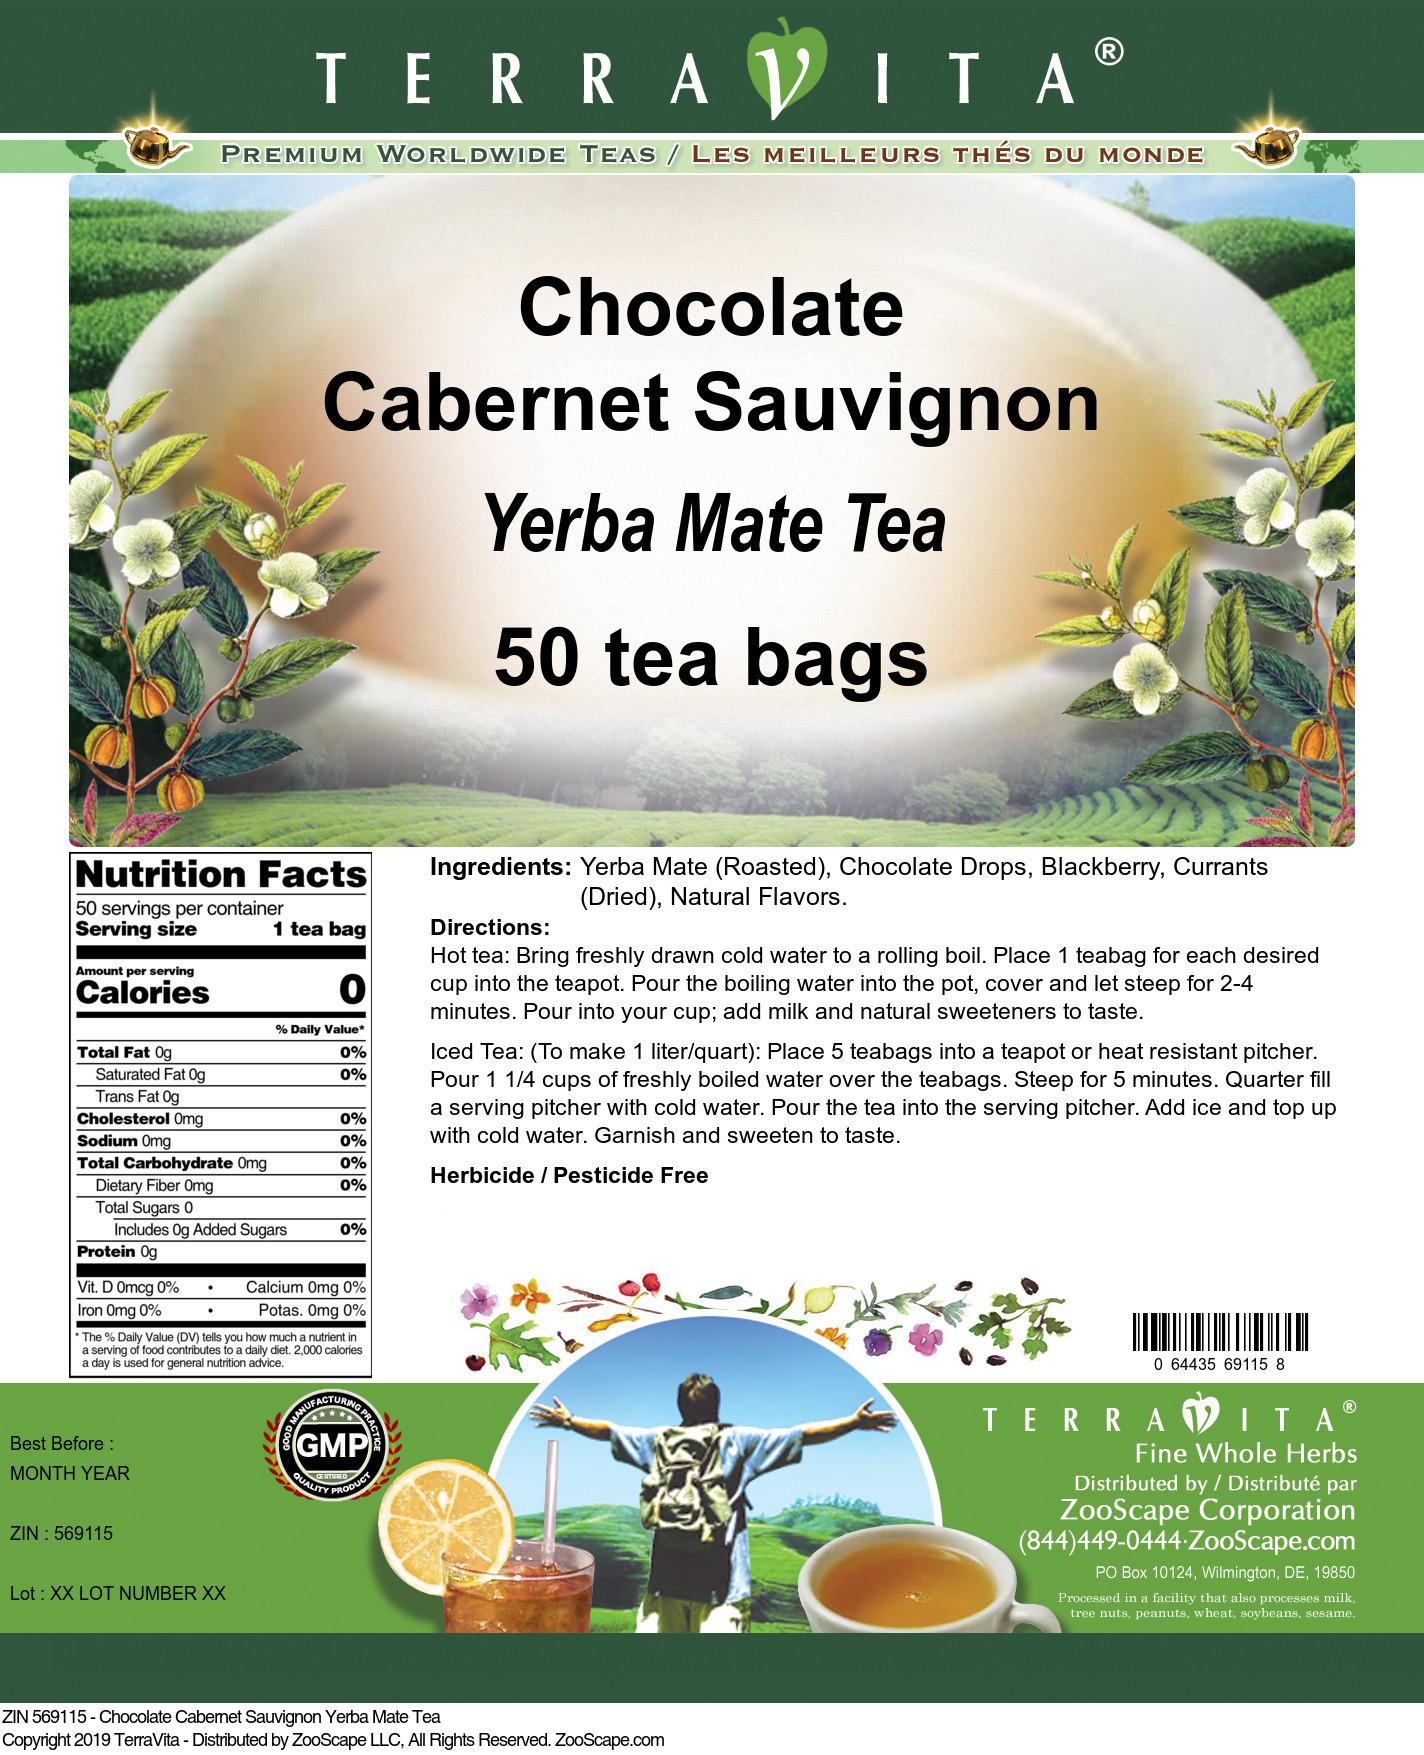 Chocolate Cabernet Sauvignon Yerba Mate Tea